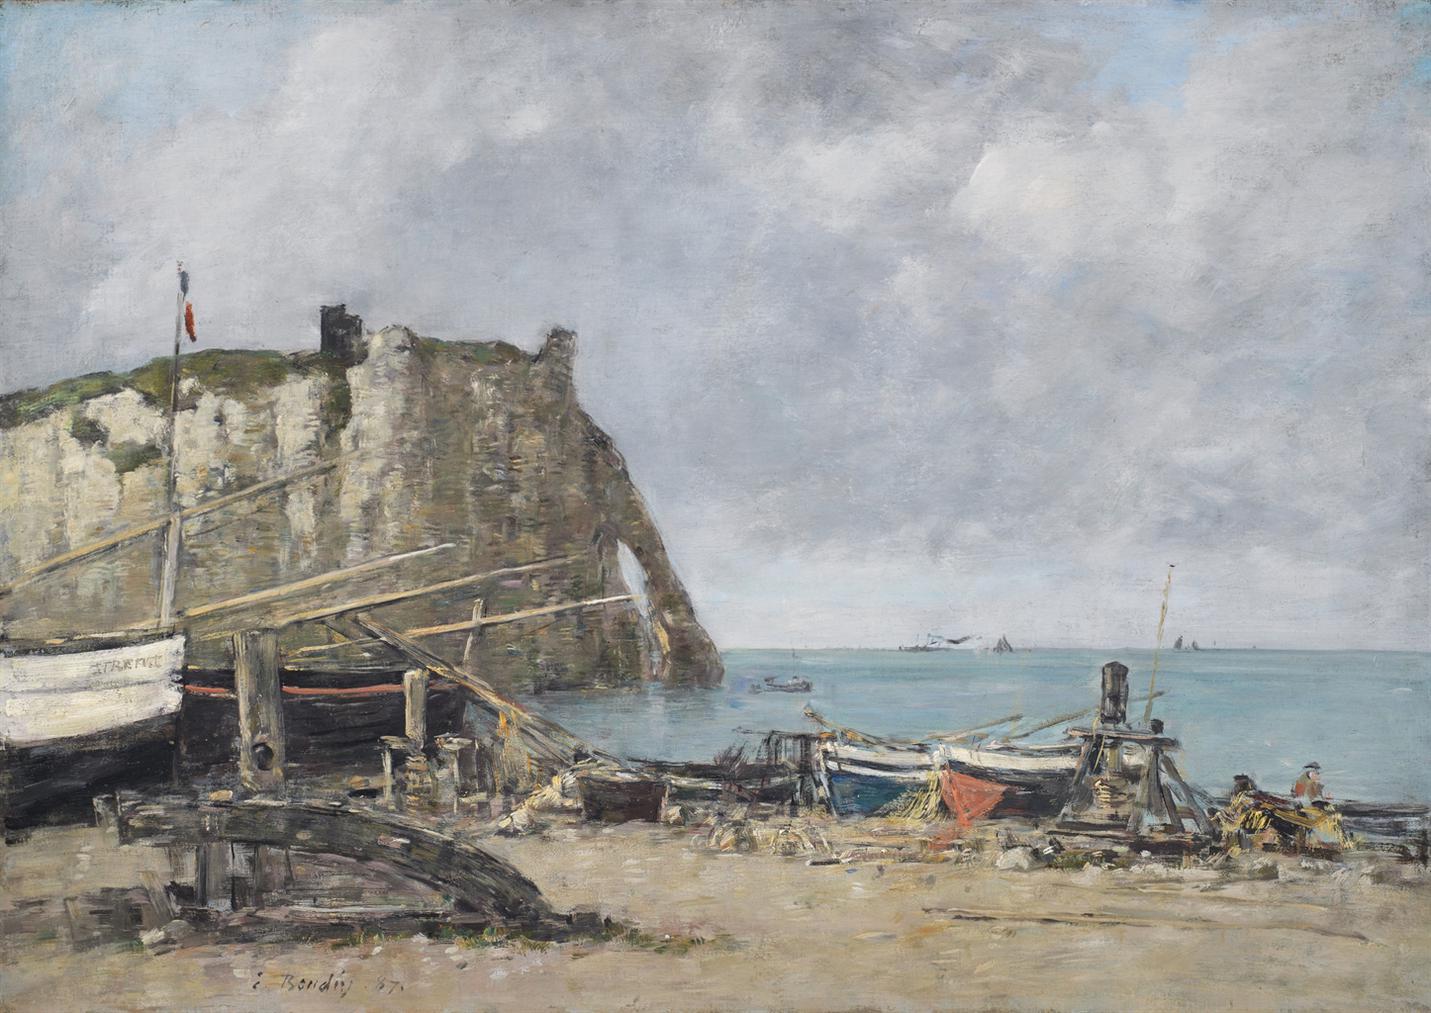 Eugene Louis Boudin-Etretat, La Falaise Daval, Maree Basse-1887